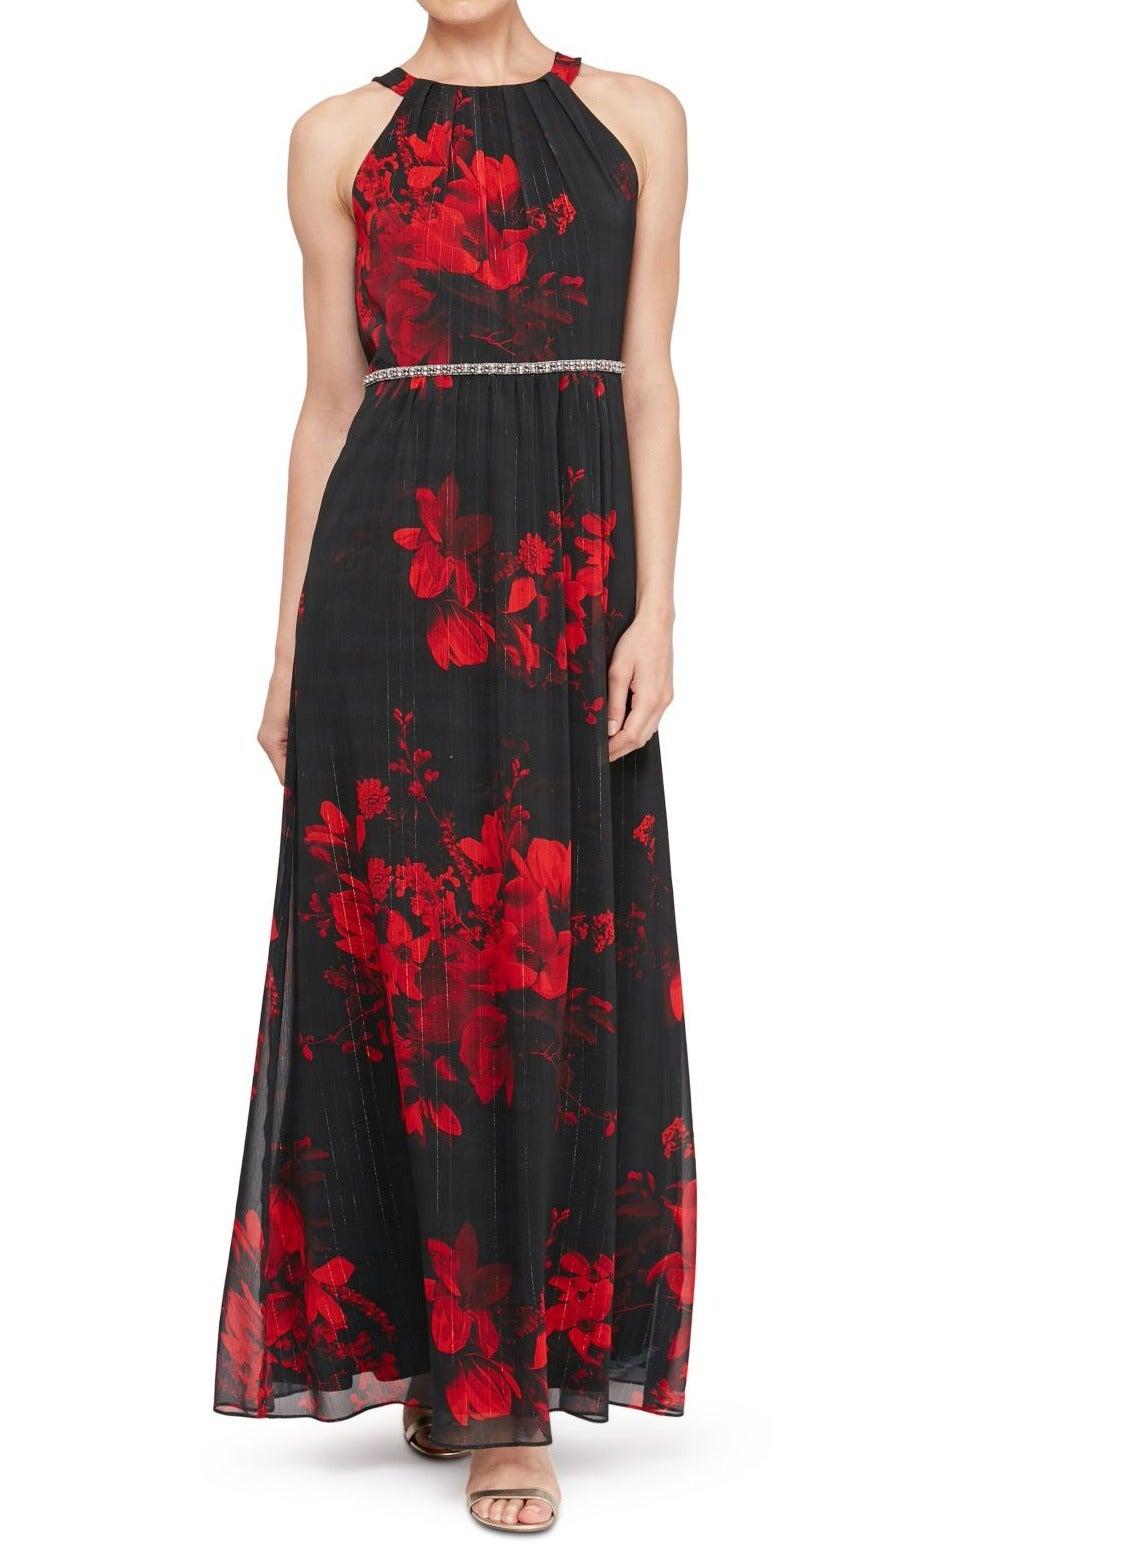 SLNY Womens Dress Black Size 16 Maxi Metallic Floral Print Bling Waist